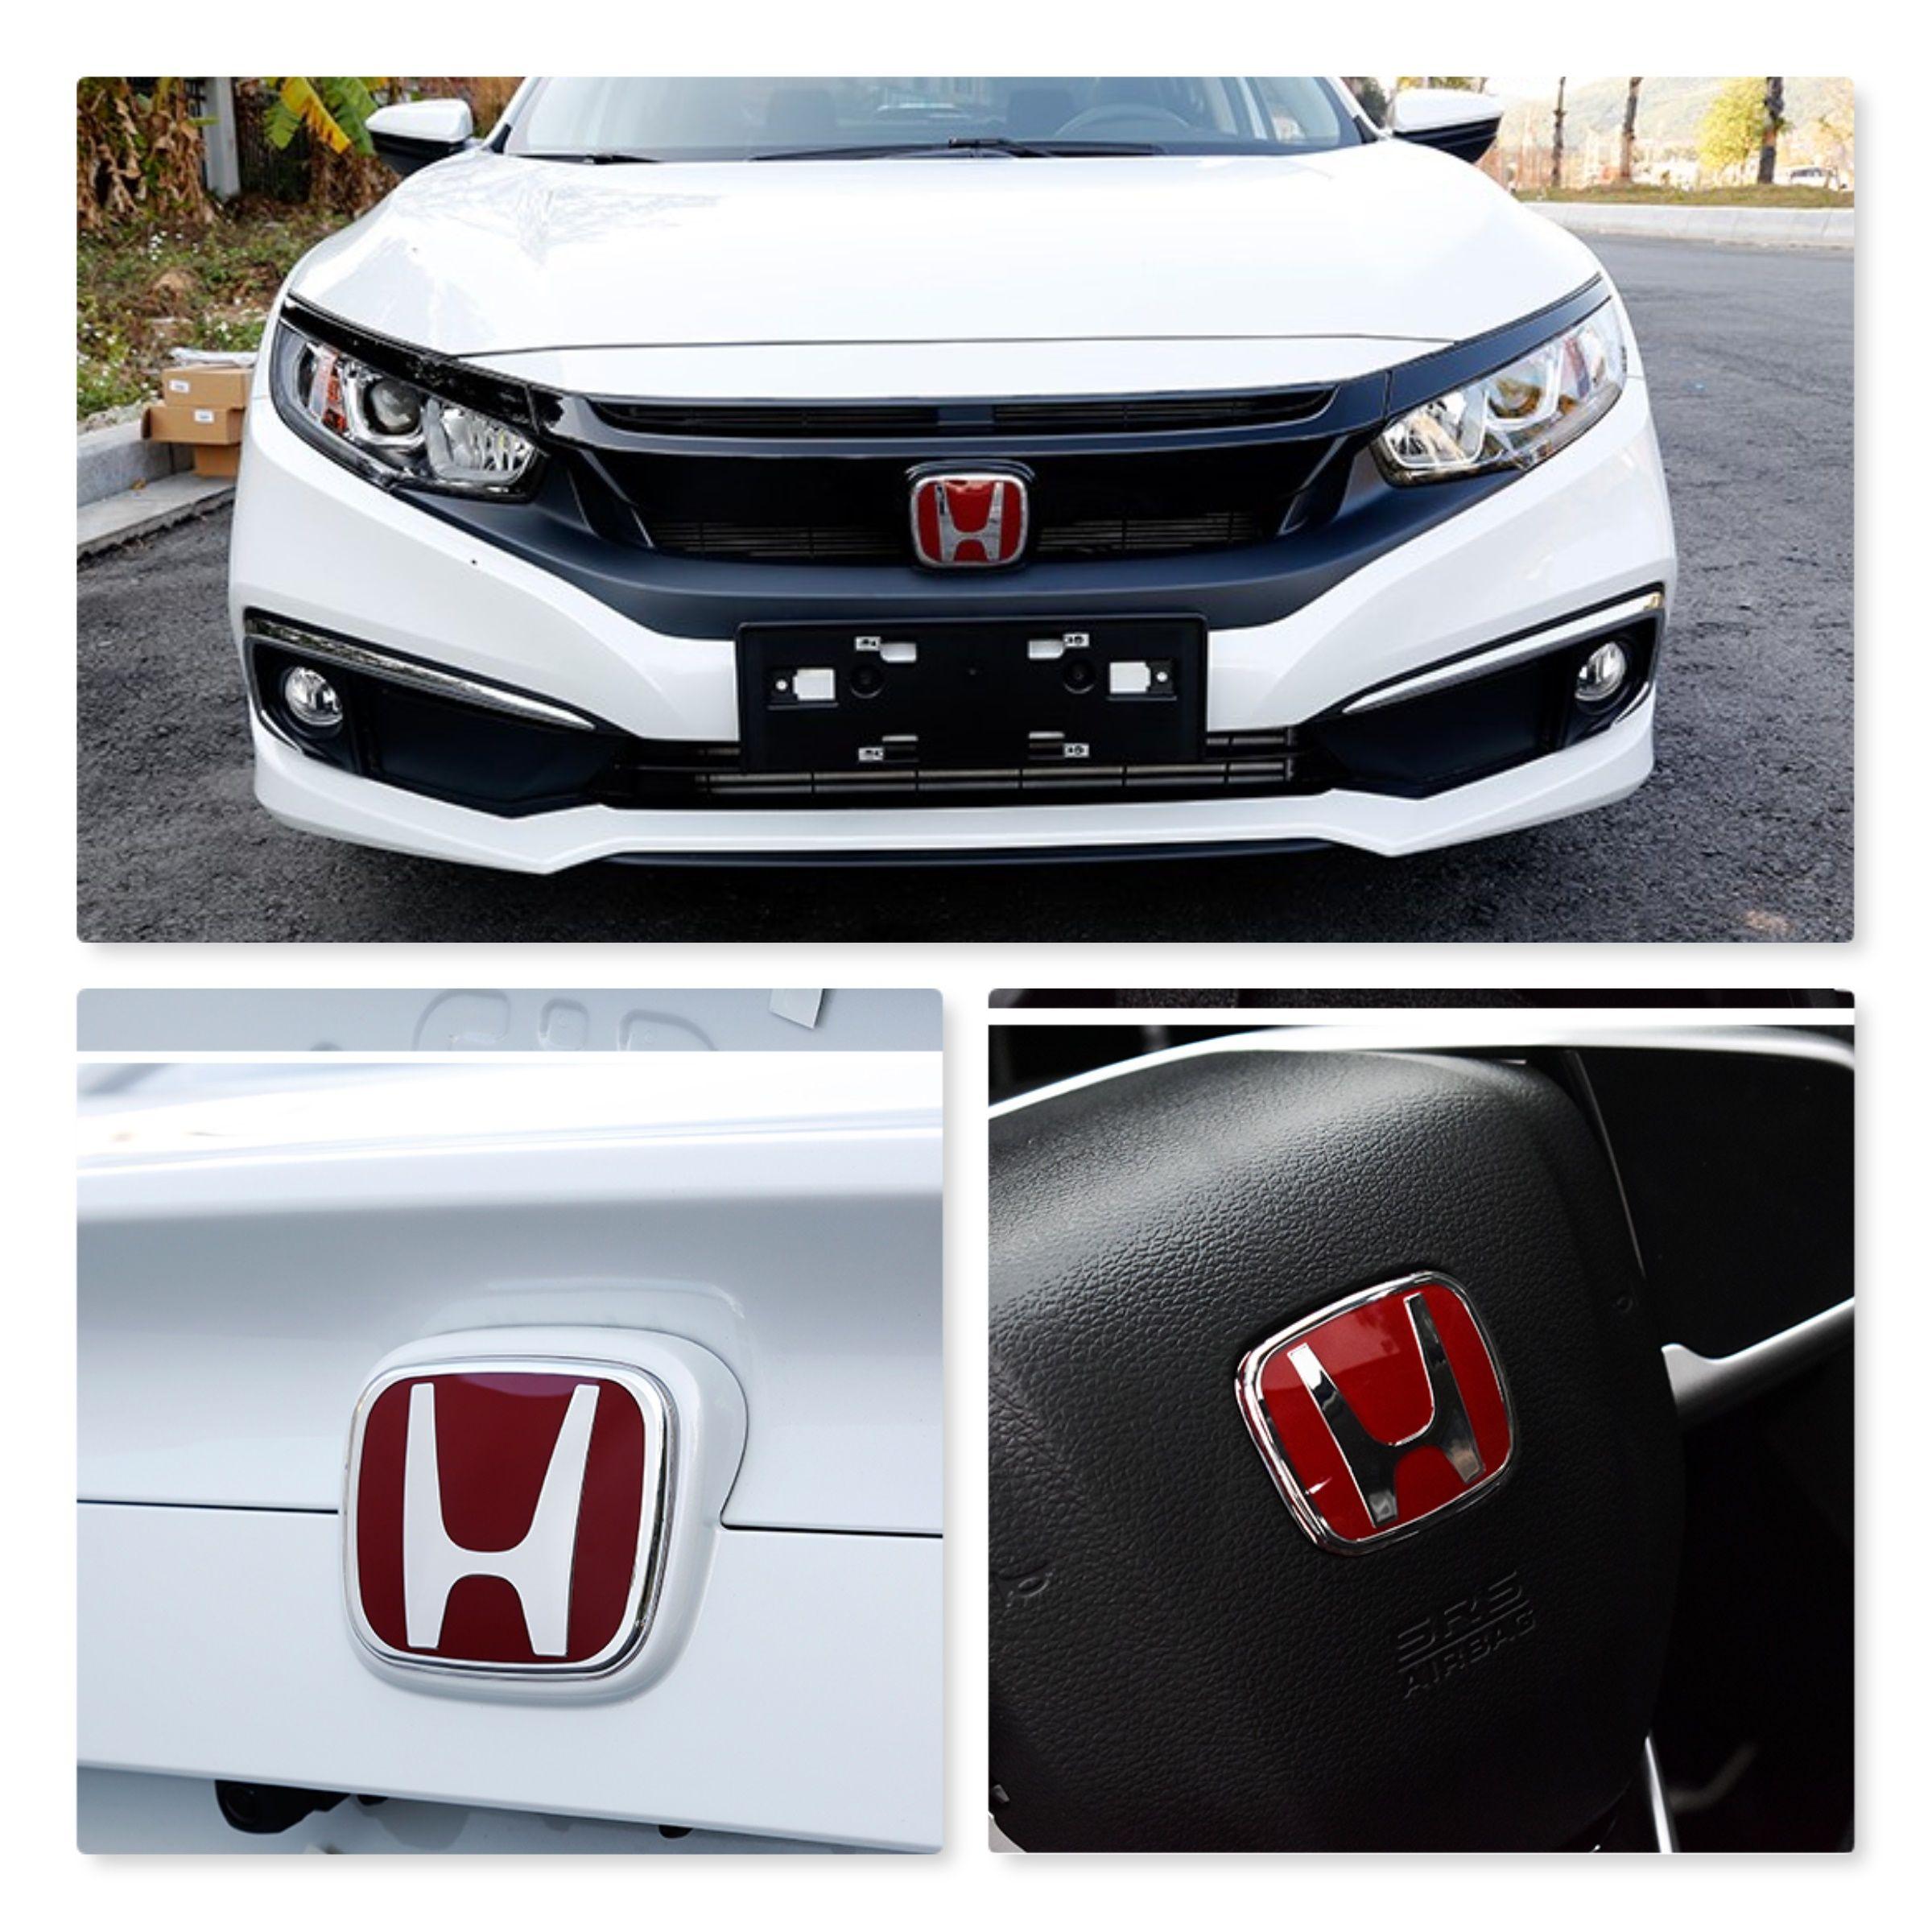 20162010 Honda Civic Si Rear+Front+Steering Wheel EMBLEM